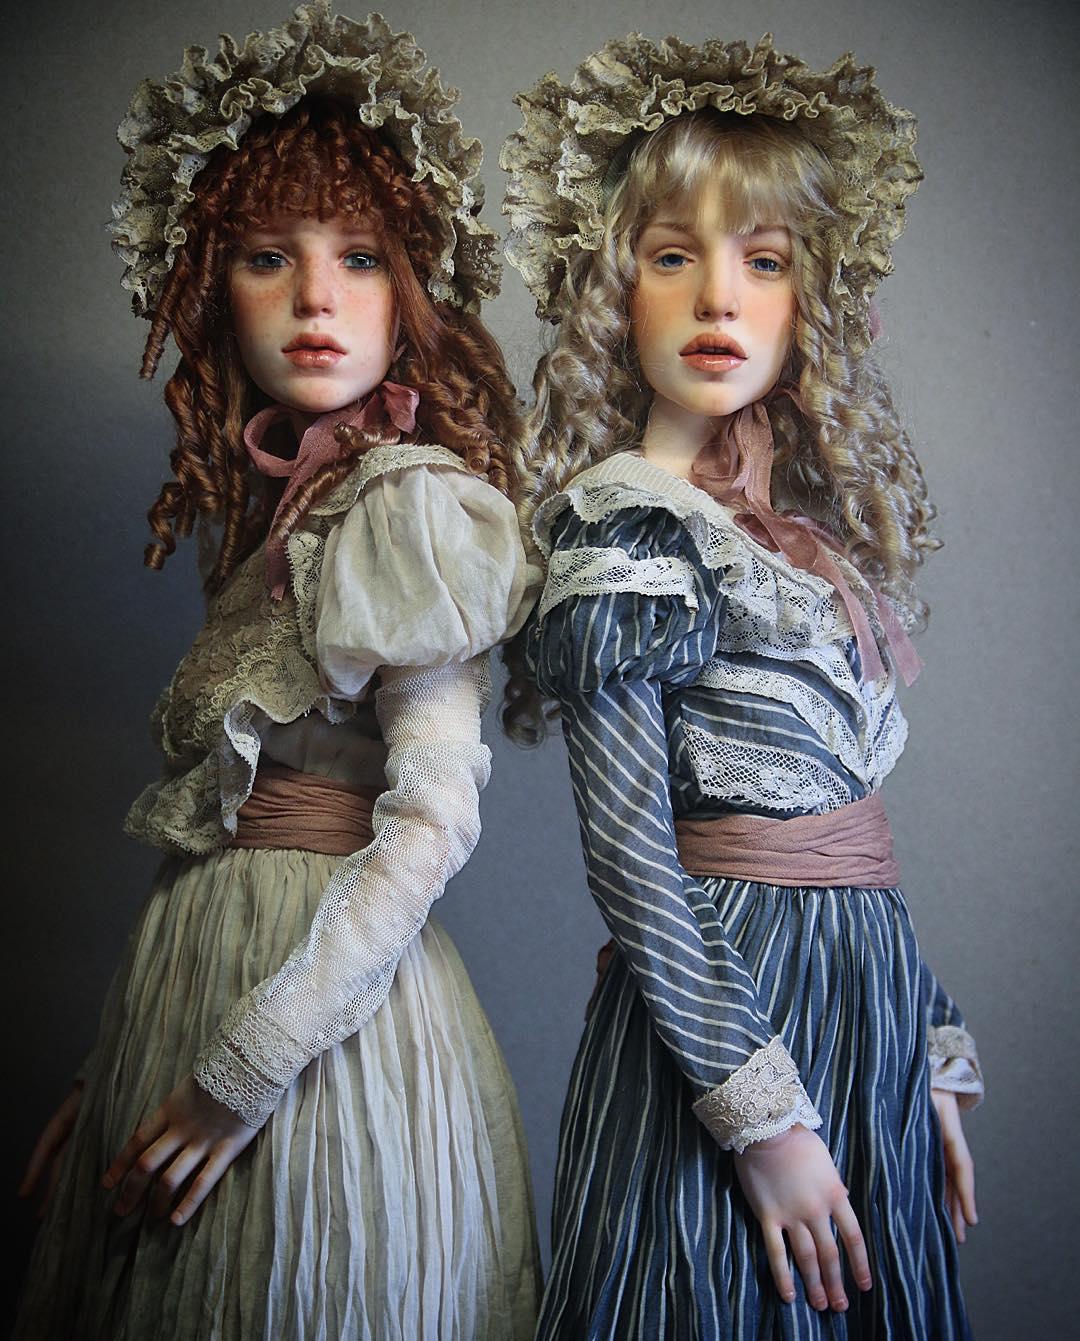 realistic-doll-faces-polymer-clay-michael-zajkov-6.jpg